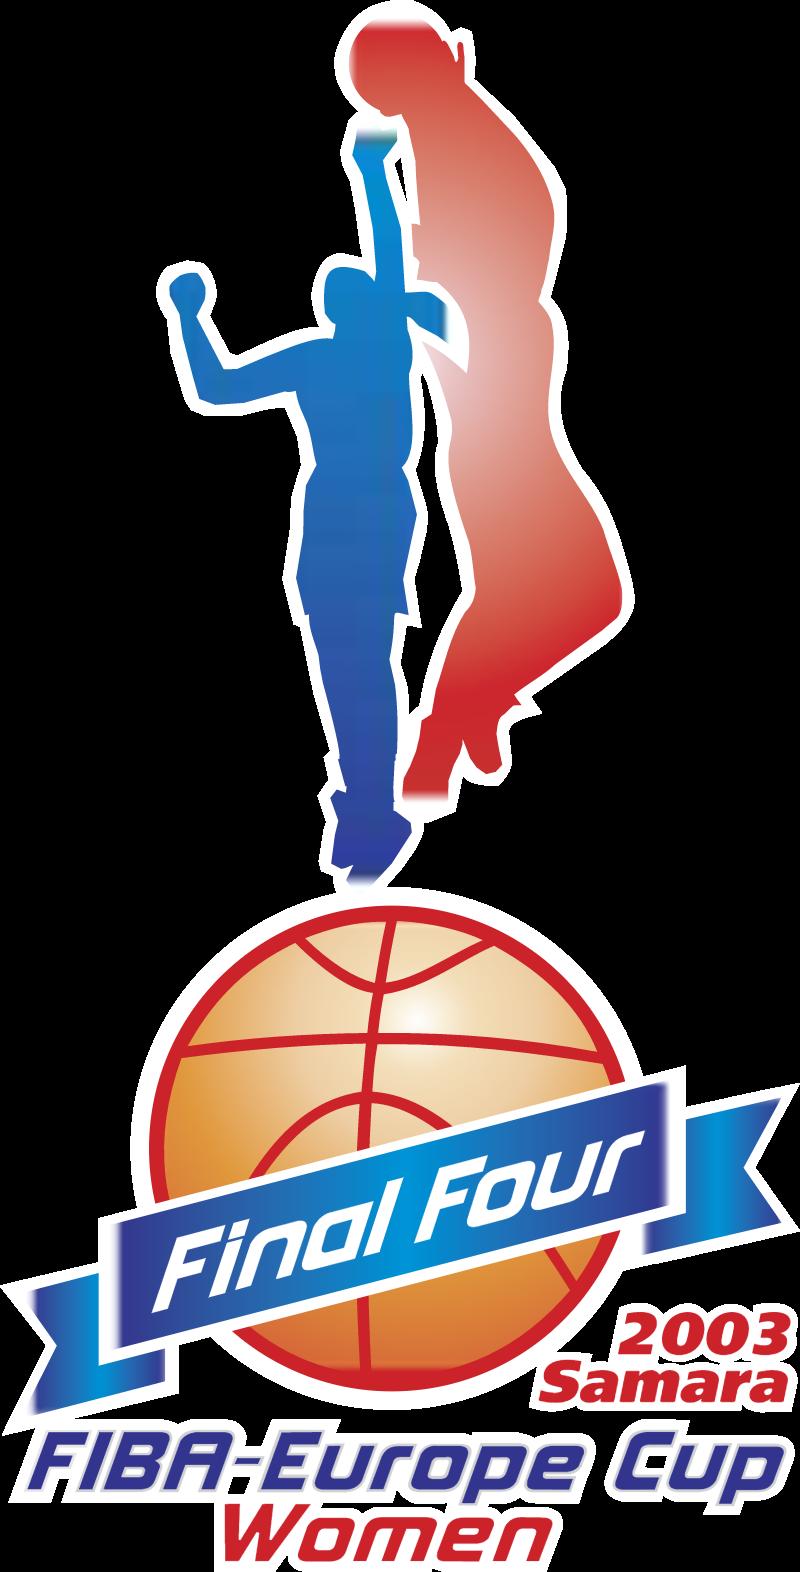 FIBA Europe Cup Women vector